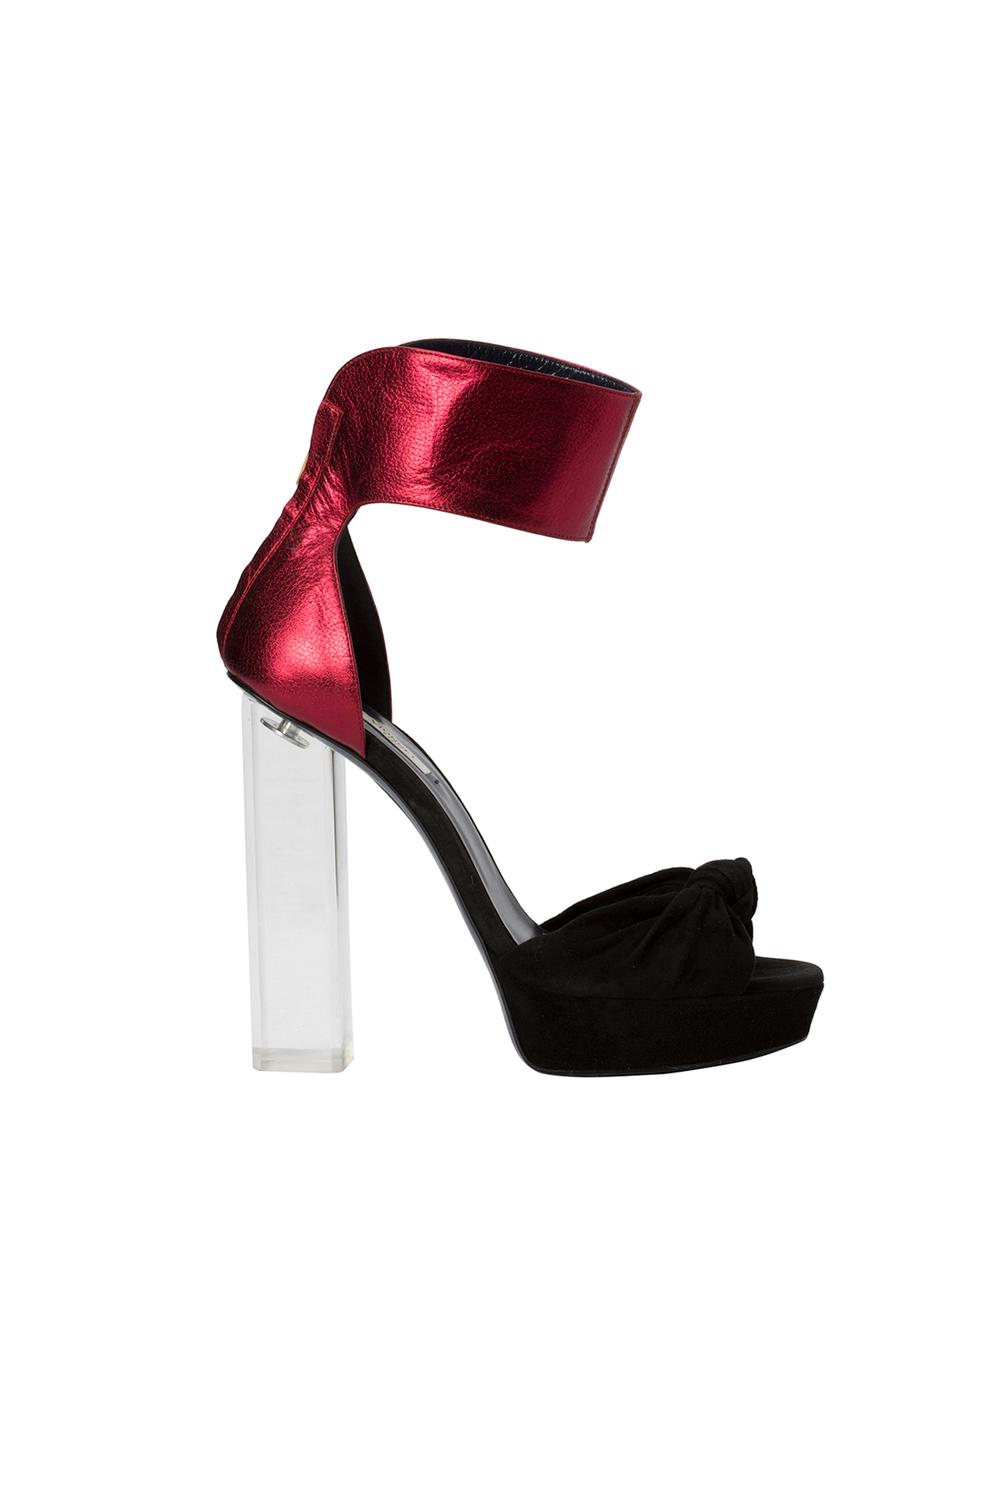 04-07-accessories-trends-fall-2015-lucite-heel.jpg